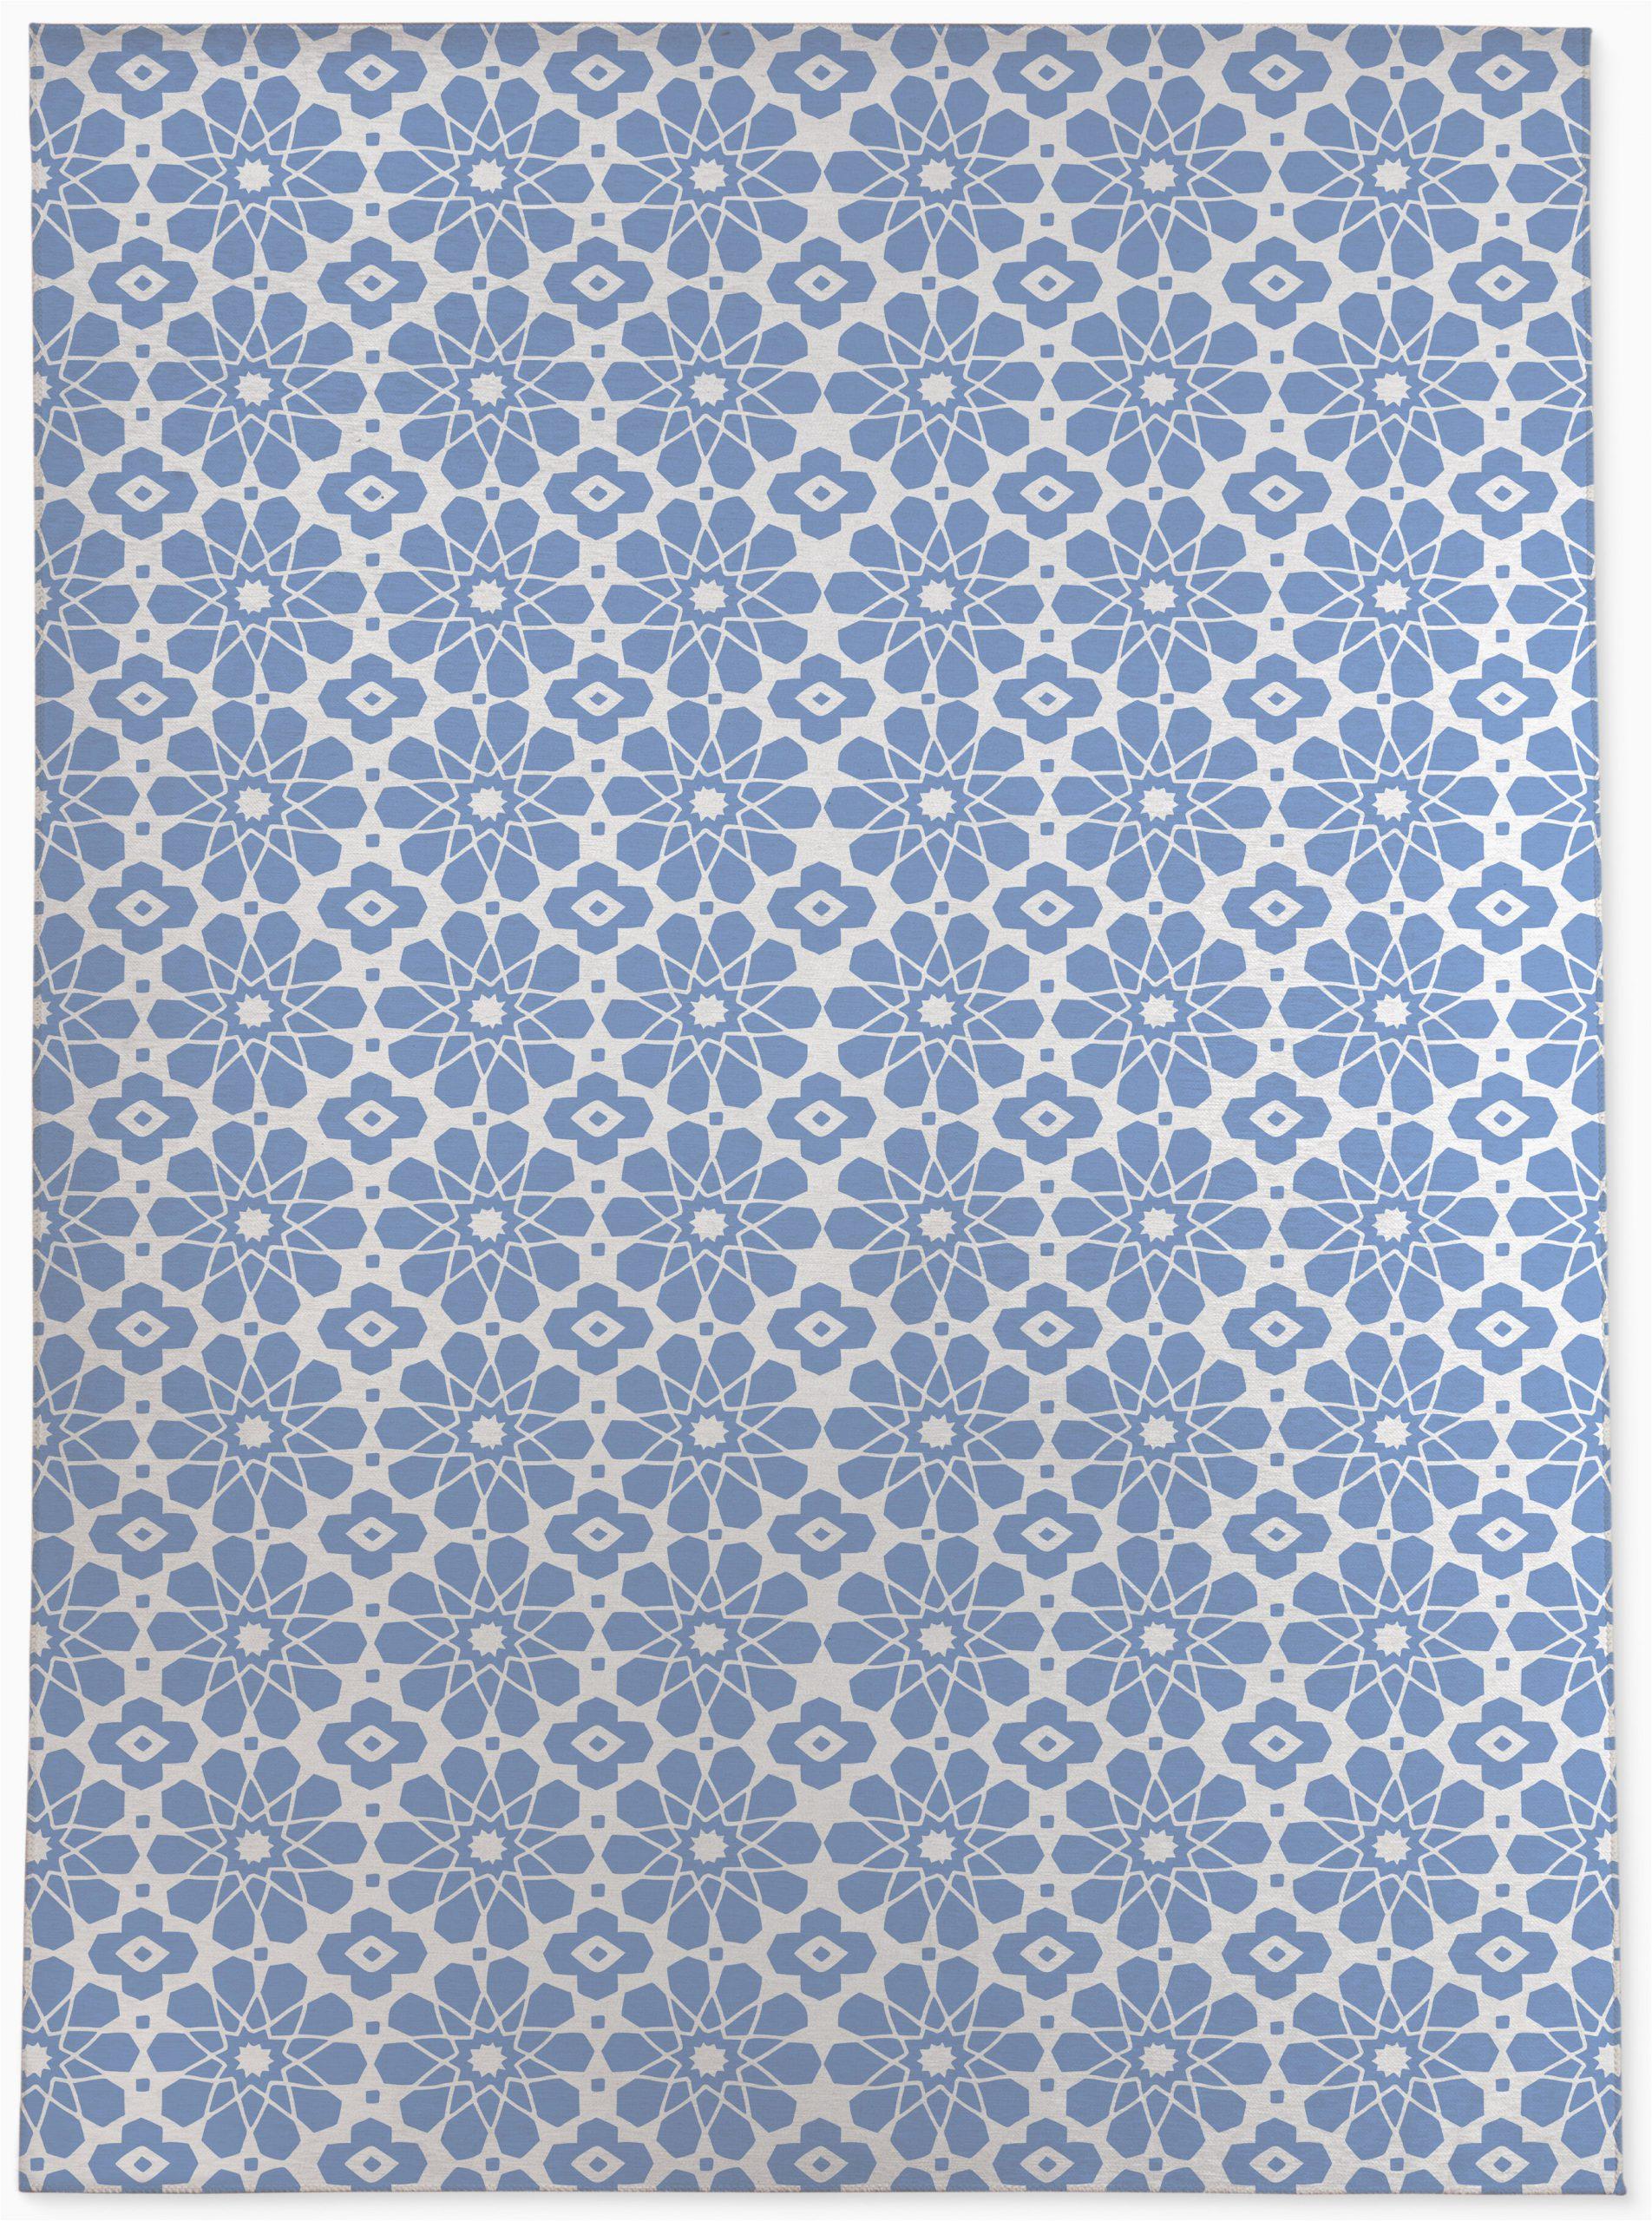 martino blueperiwinkle area rug